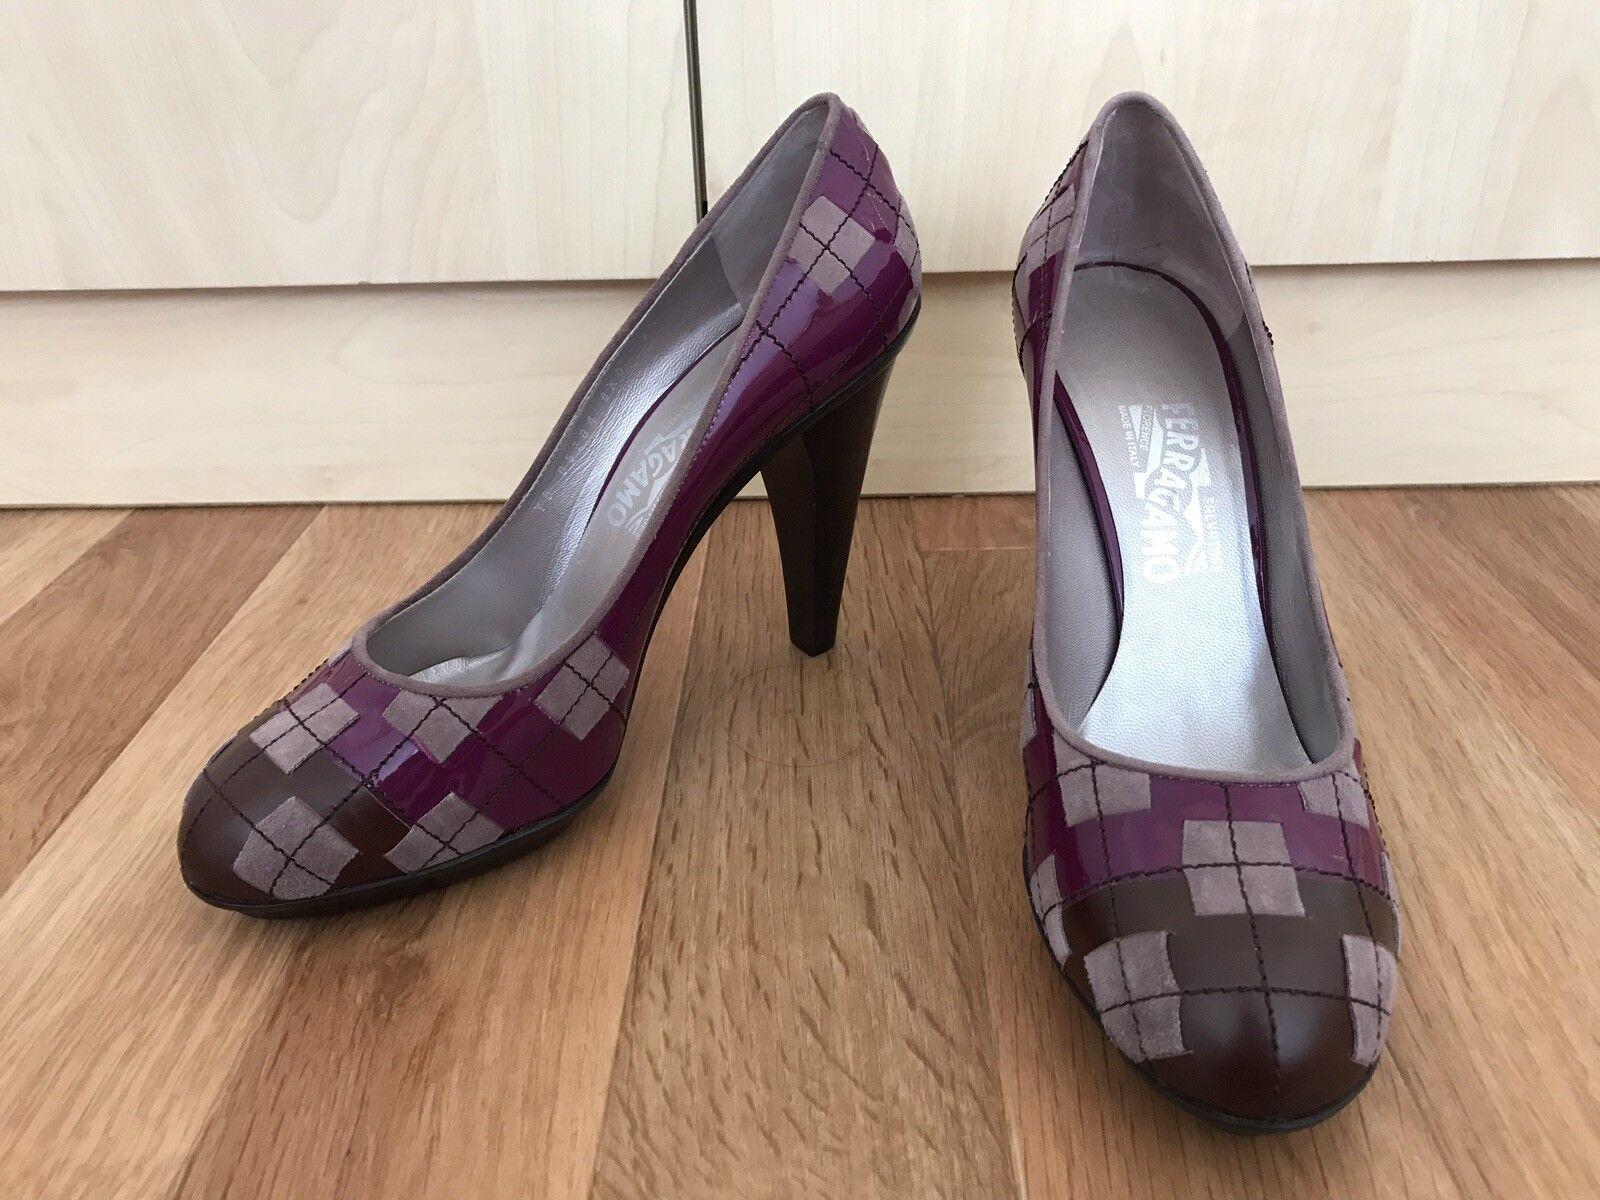 Salvatore Ferragamo  Chaussures Escarpins talons hauts cuir marron violet taille 40 NEUF